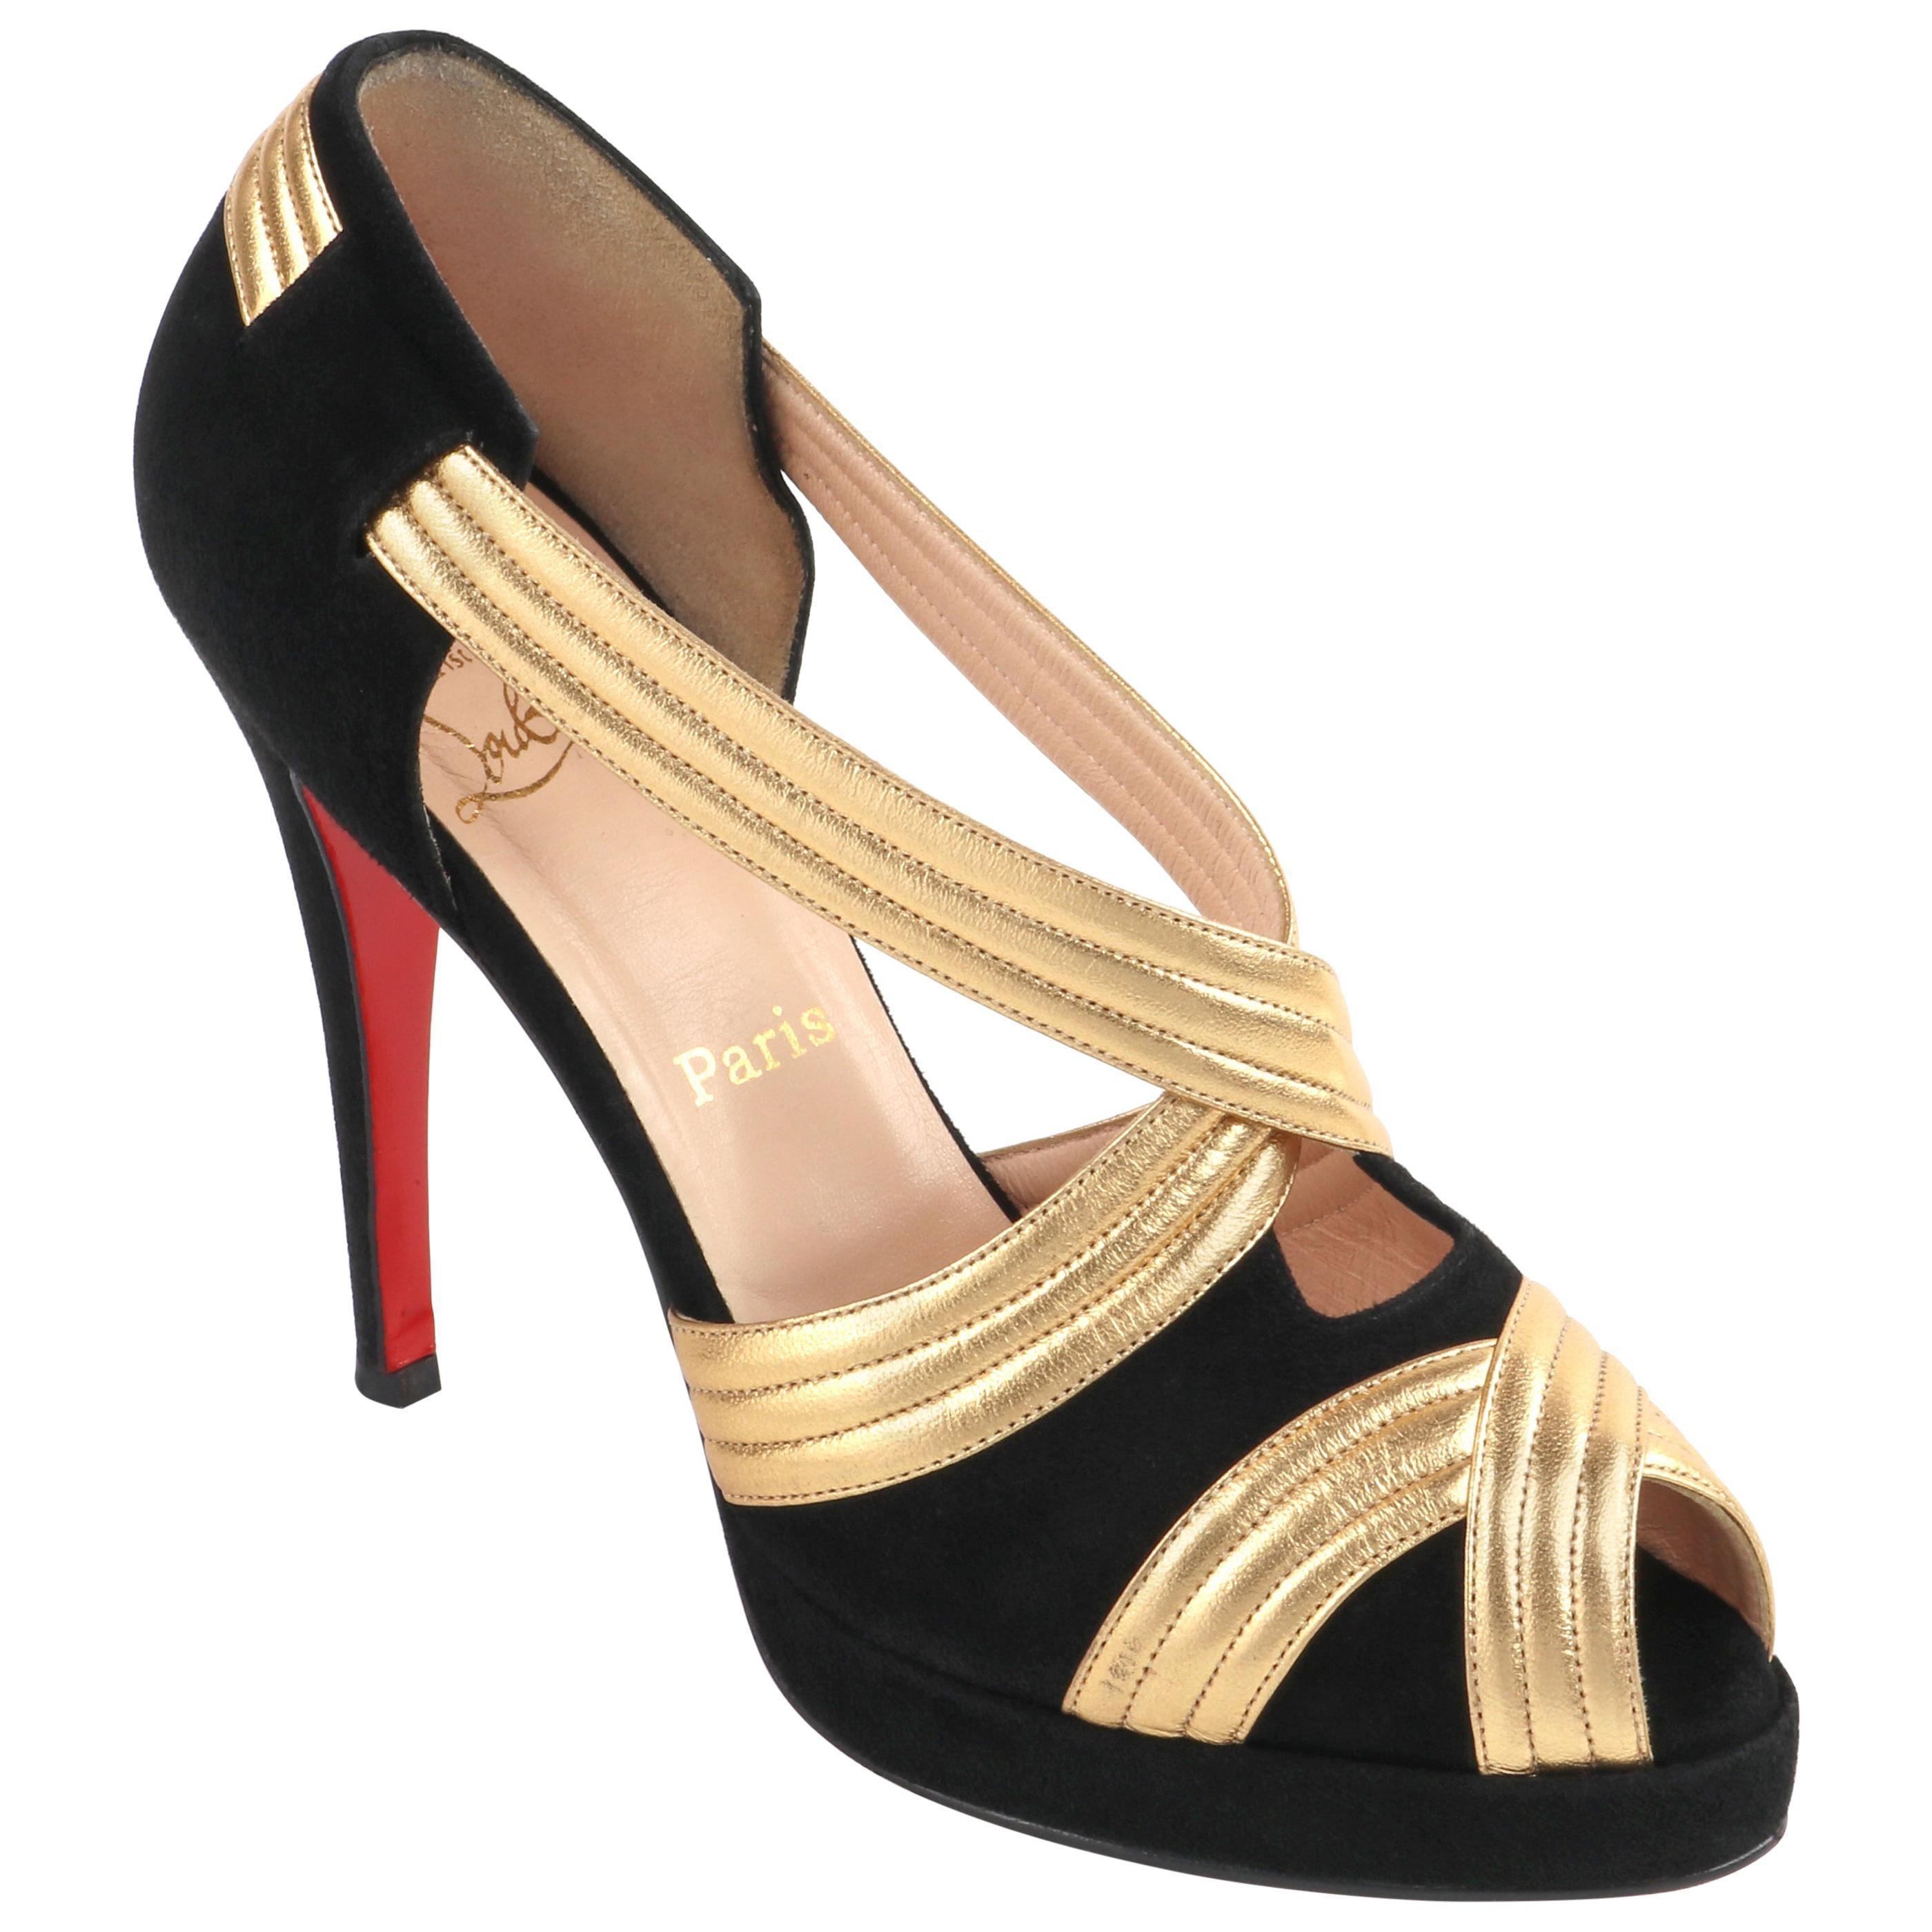 "CHRISTIAN LOUBOUTIN ""Josefa 120"" Suede Leather Peep Toe Platform Pump Heels"